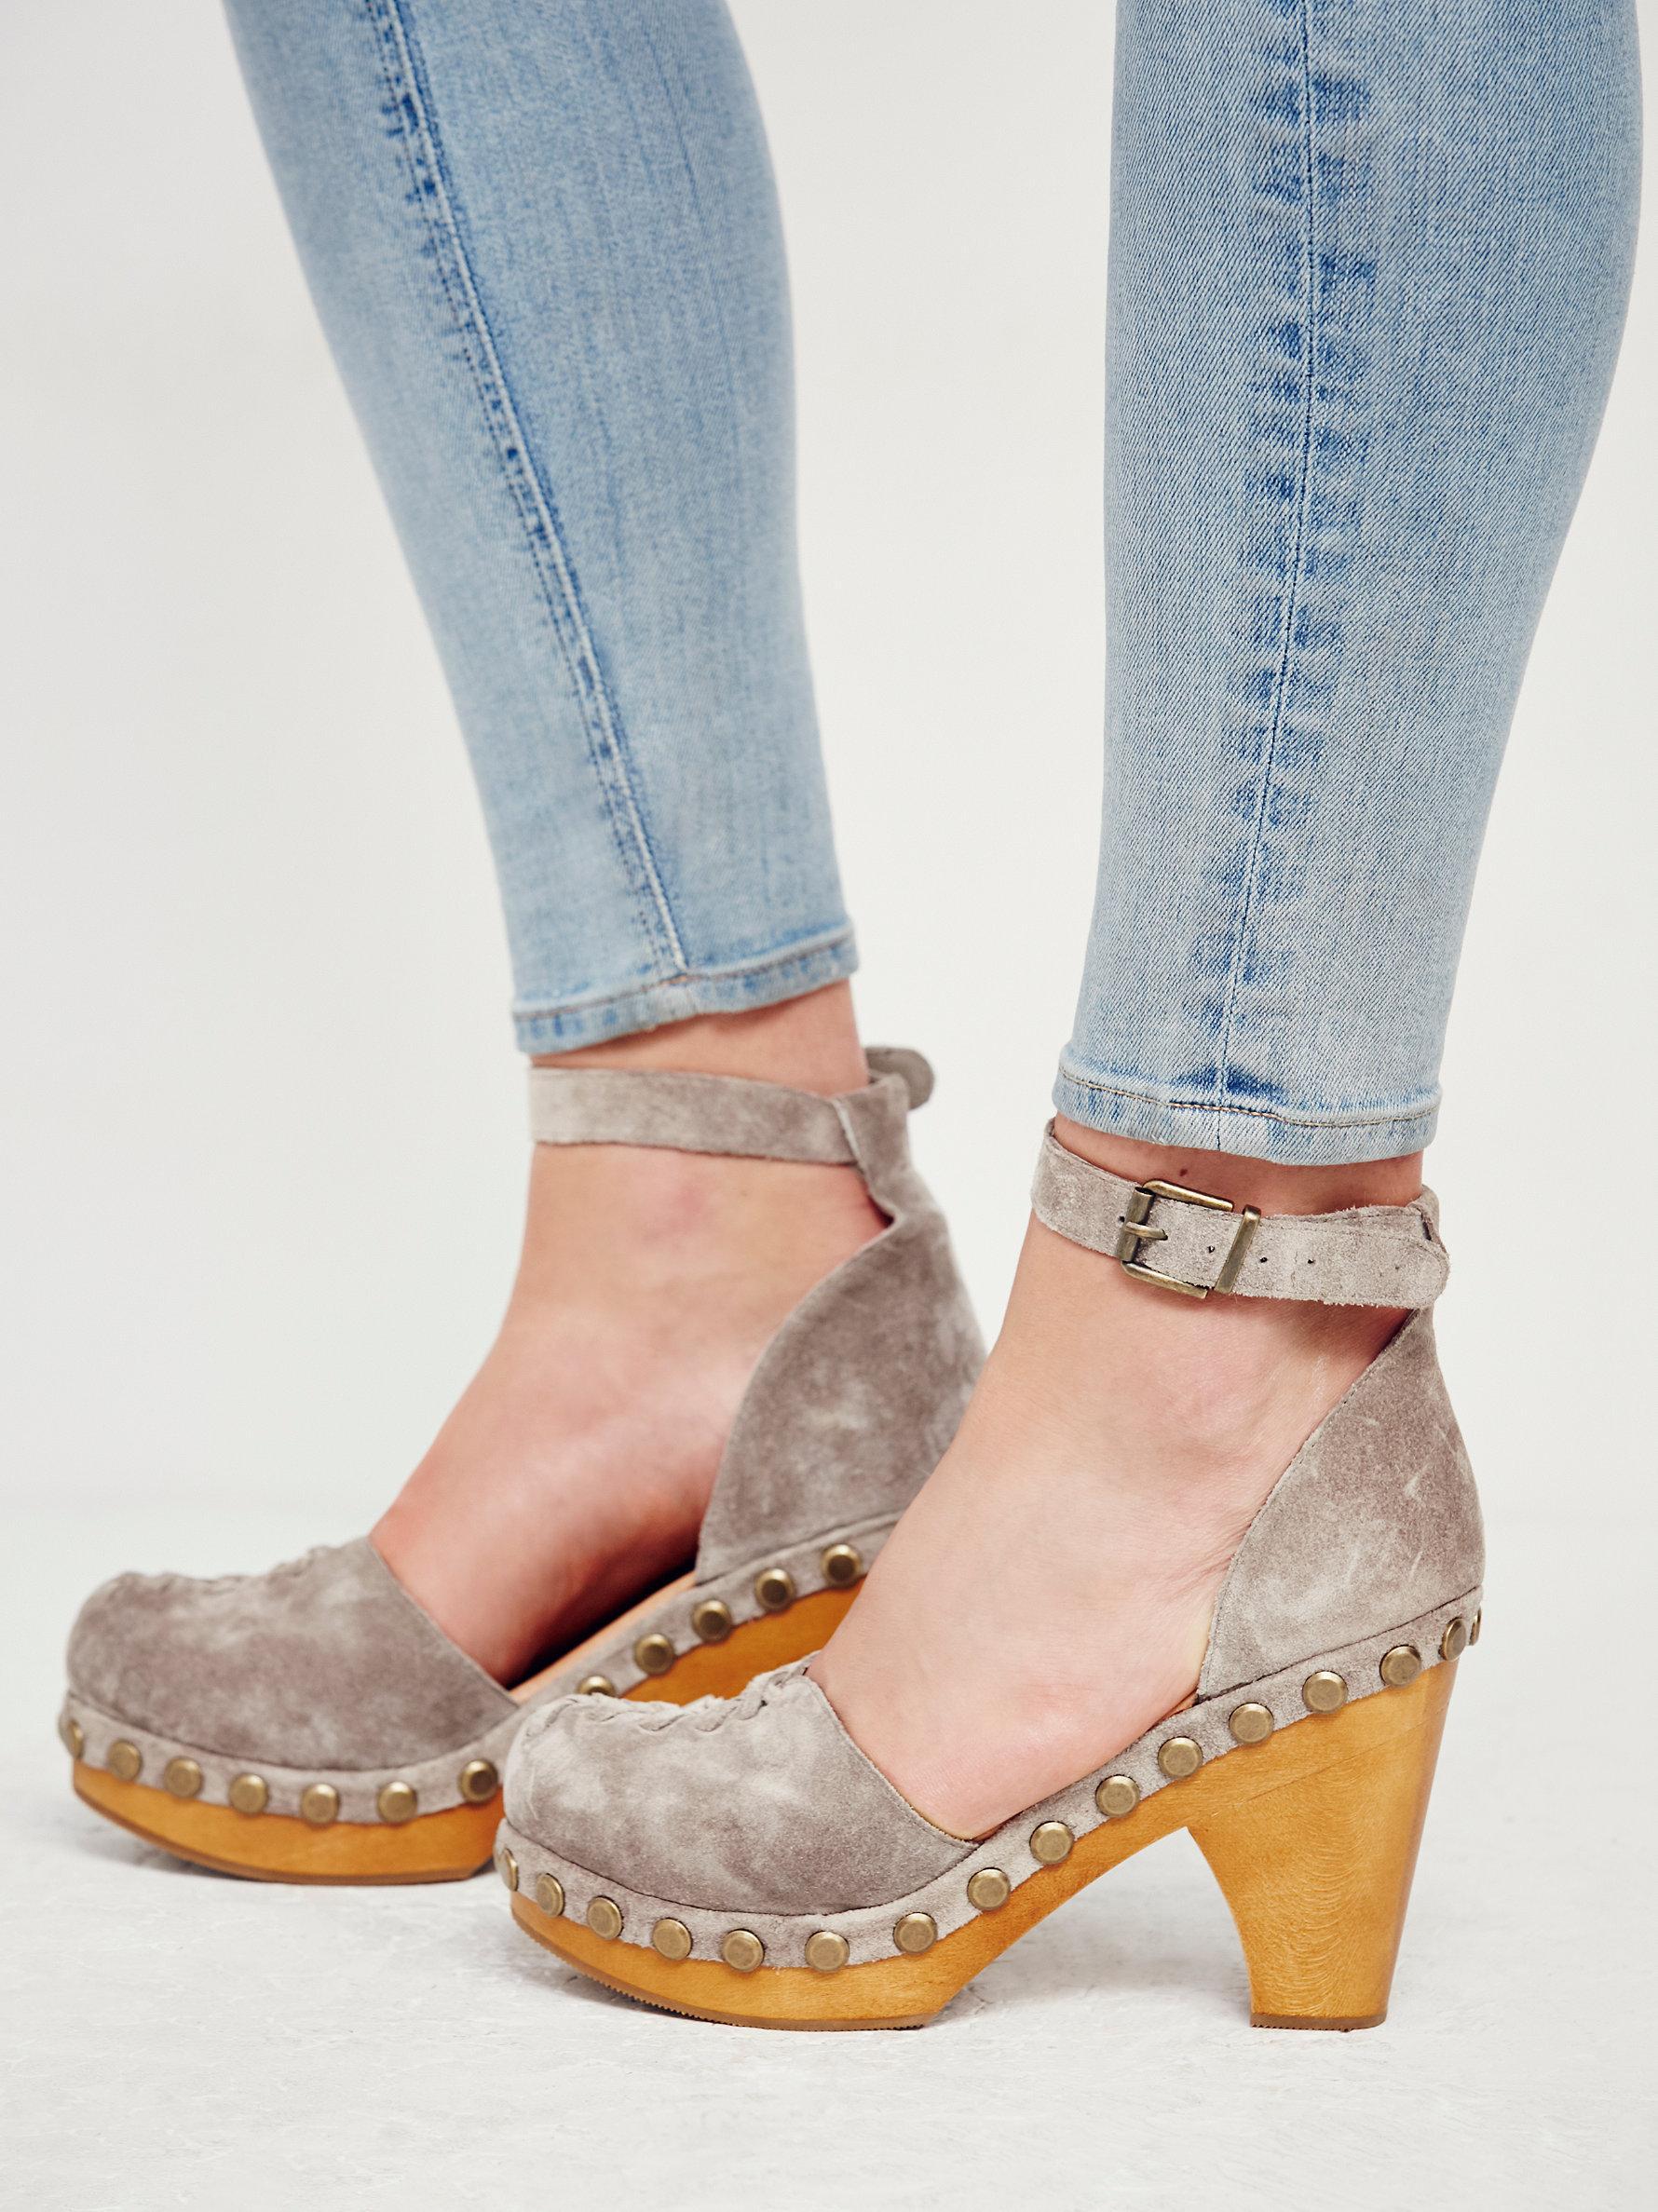 Damir Doma Shoes Sizing